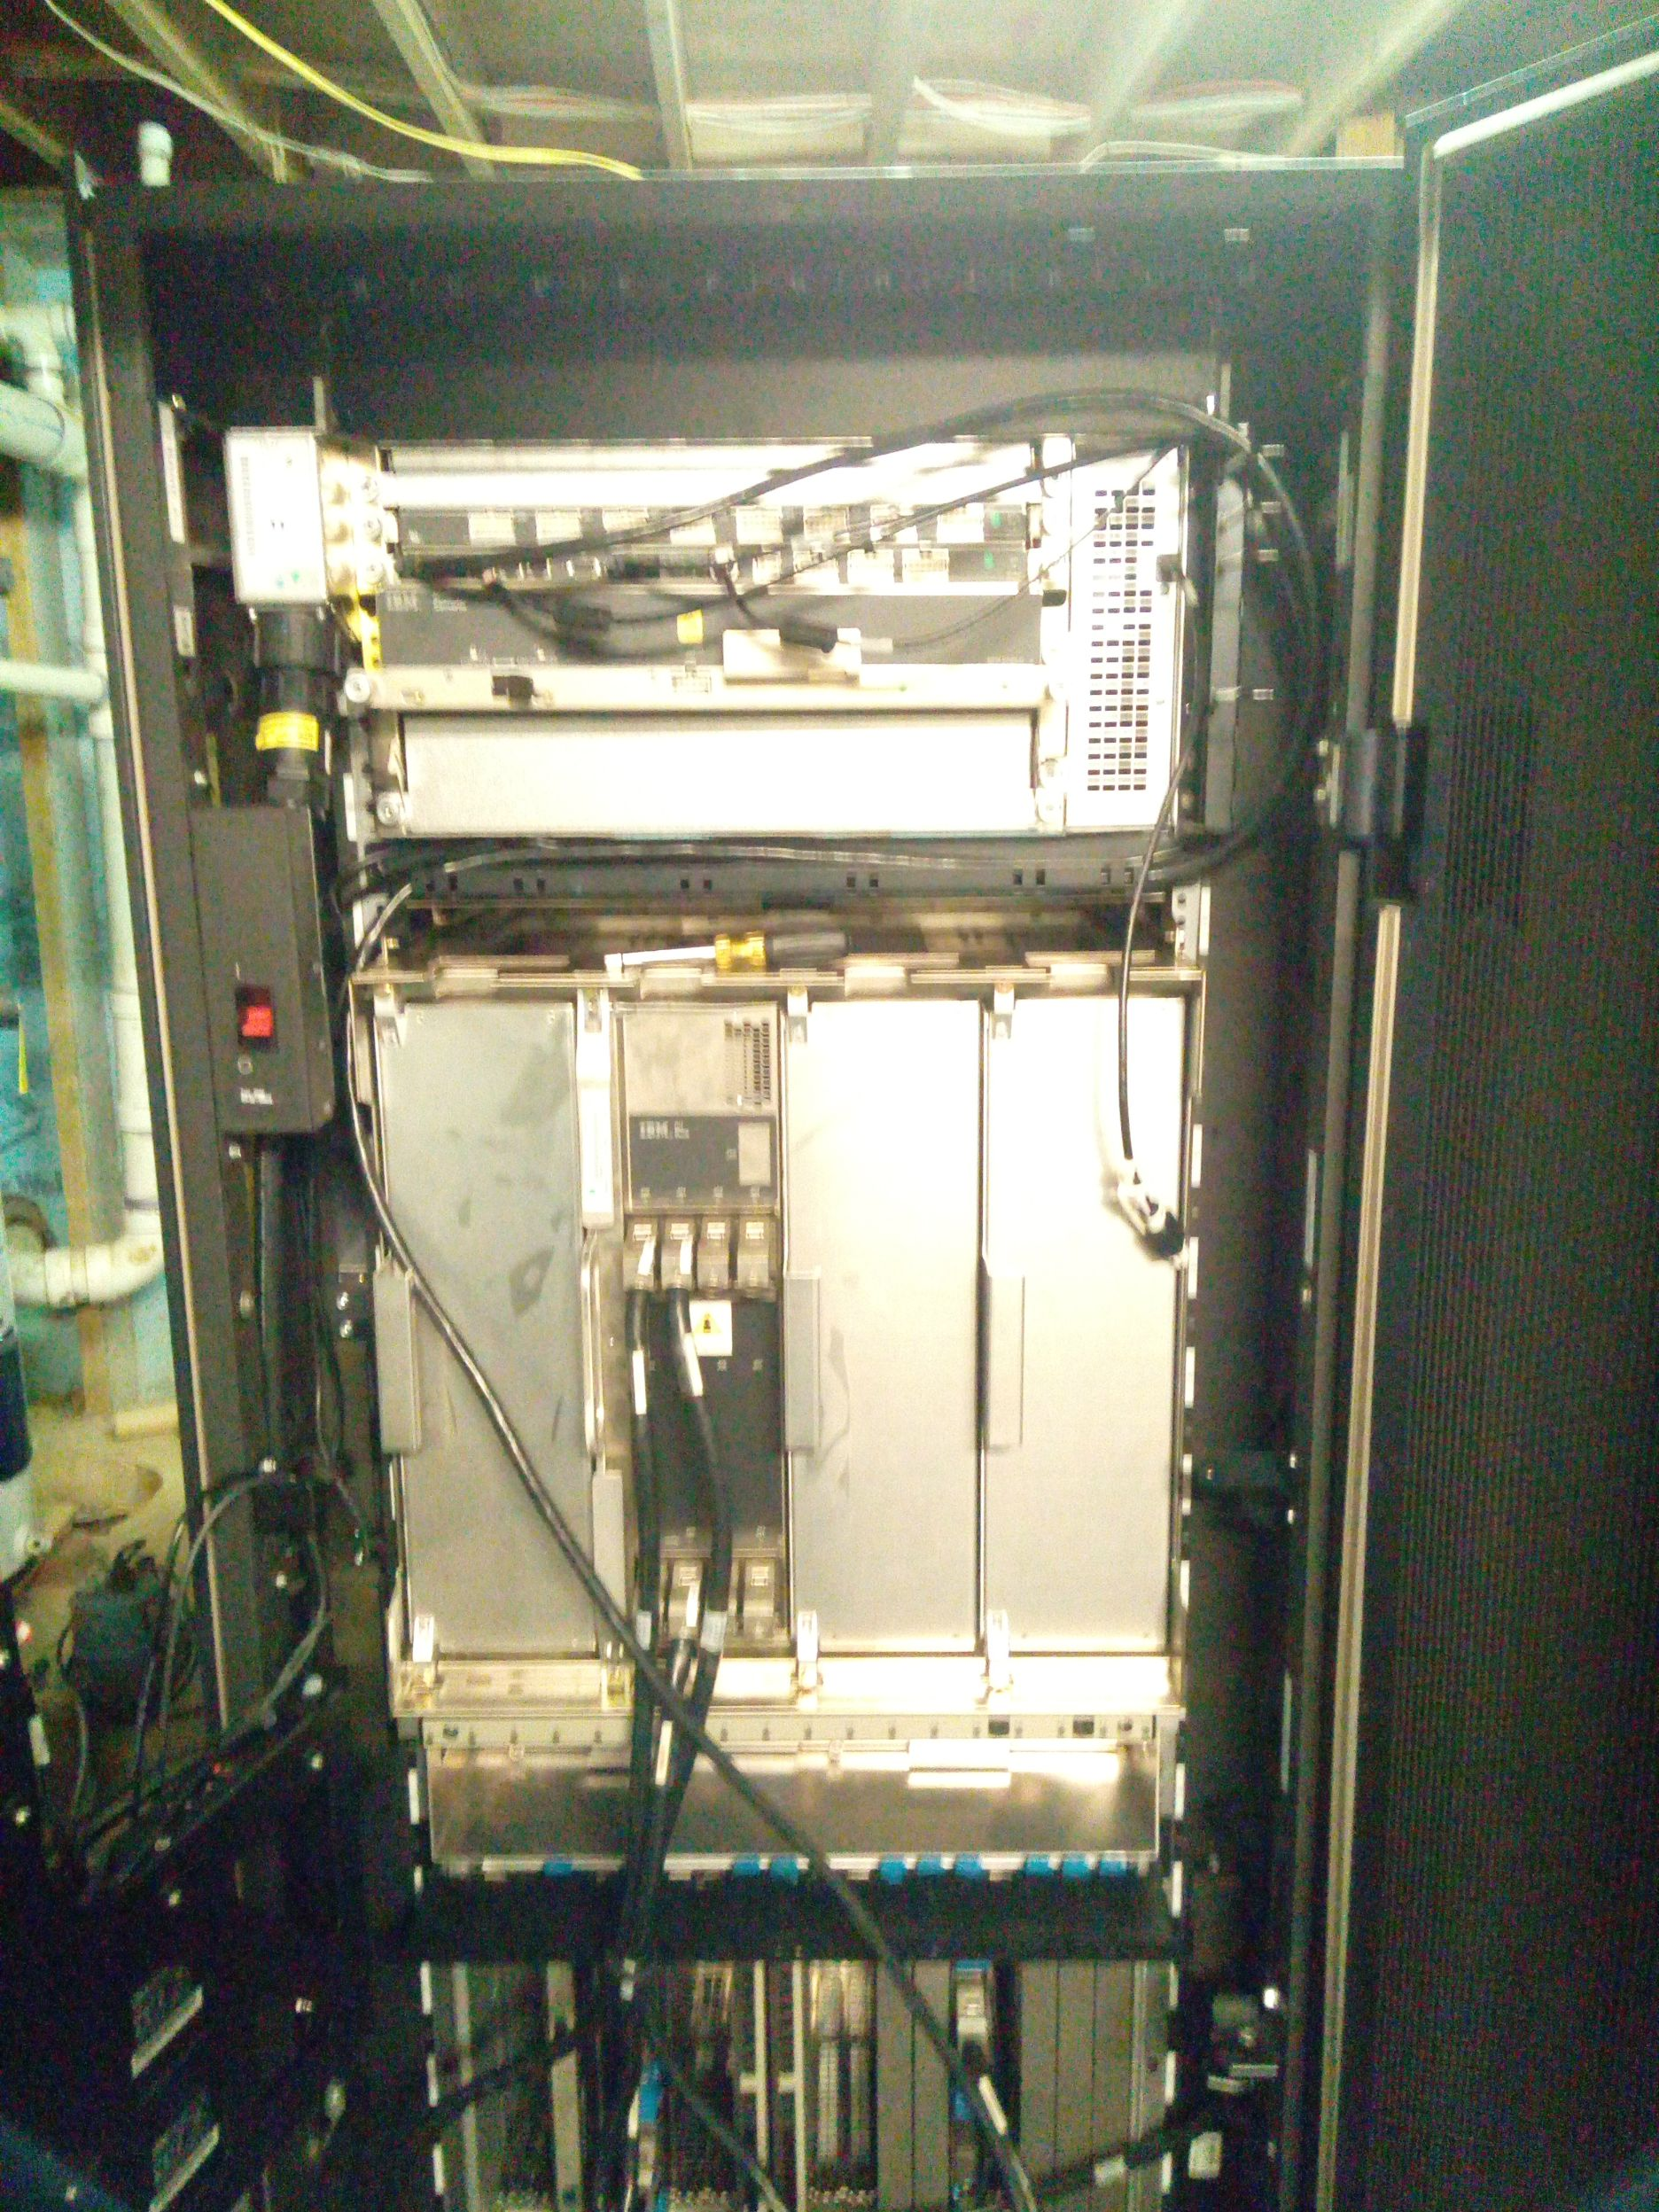 18-летний энтузиаст купил и установил в подвале мейнфрейм IBM z890 (2004 год) - 10